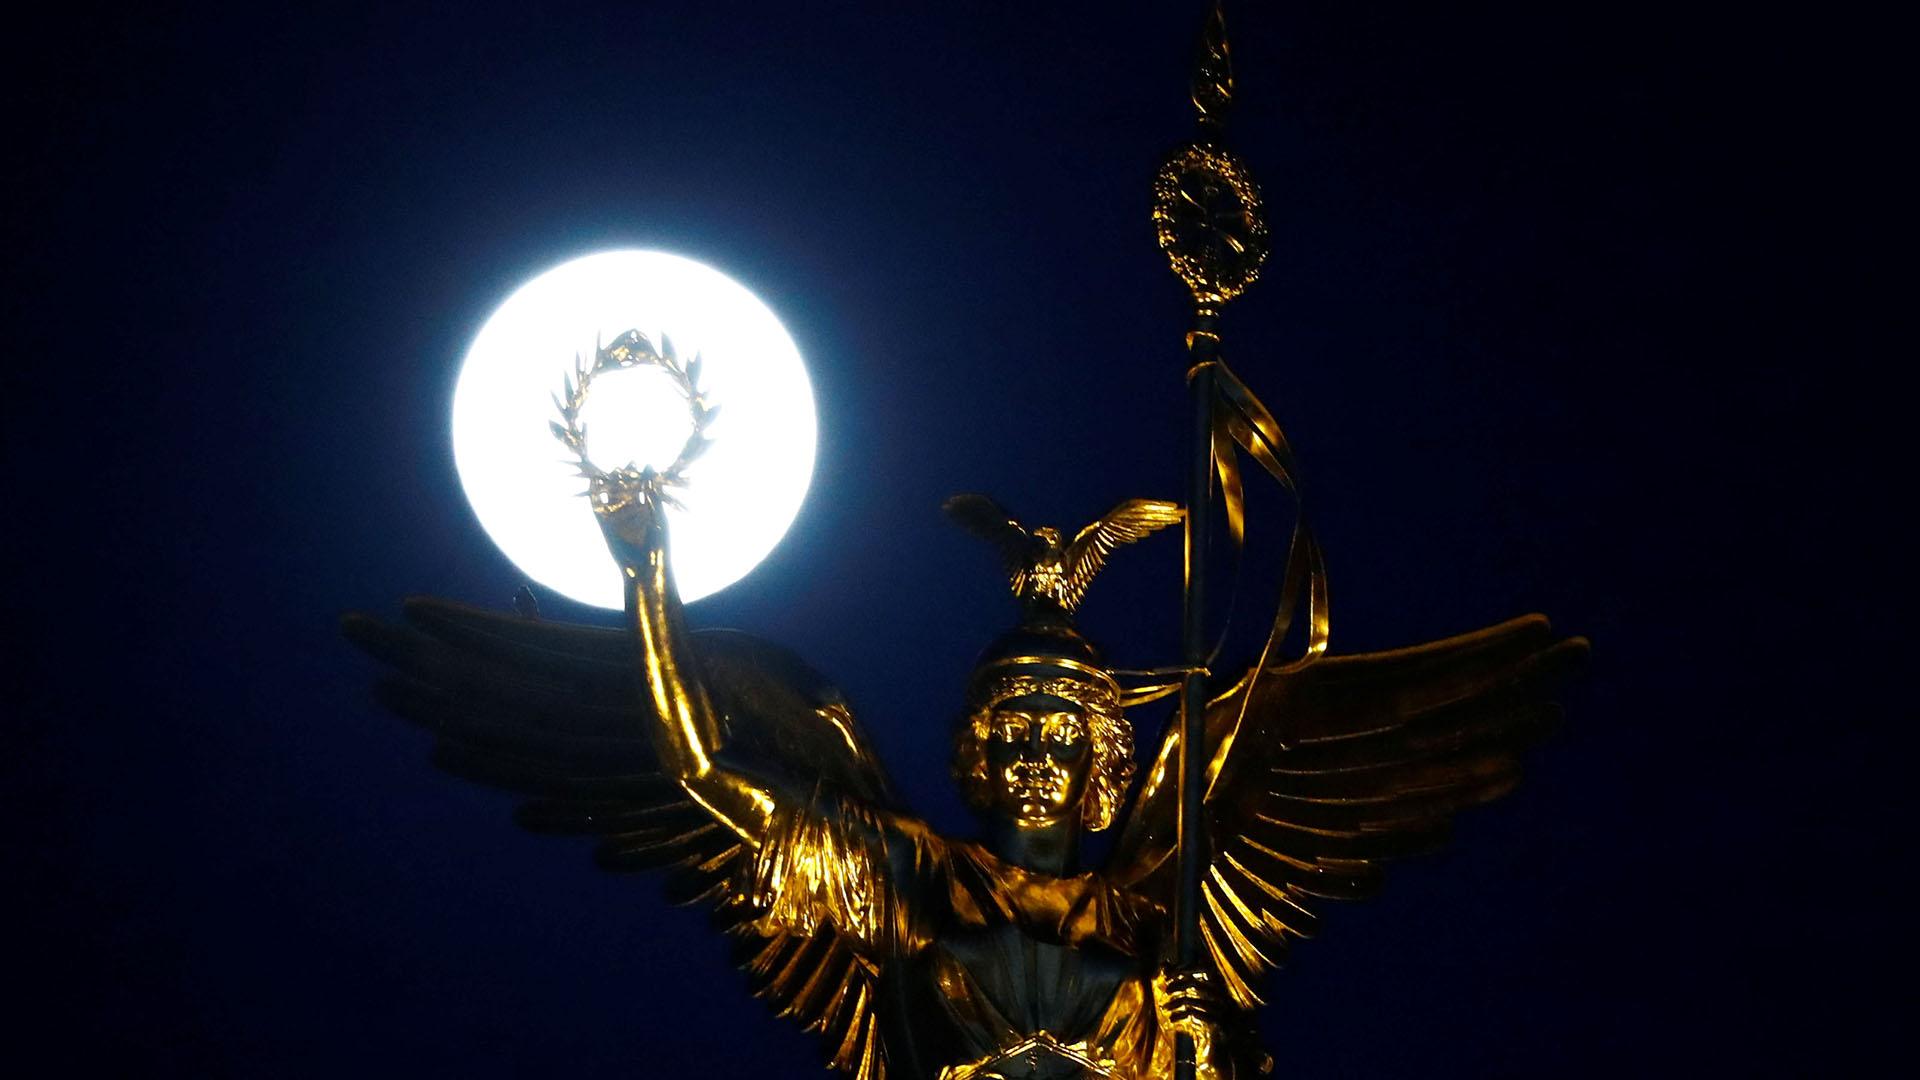 La Superluna, encima de la Columna de la Victoria, en Berlín (REUTERS/Fabrizio Bensch)